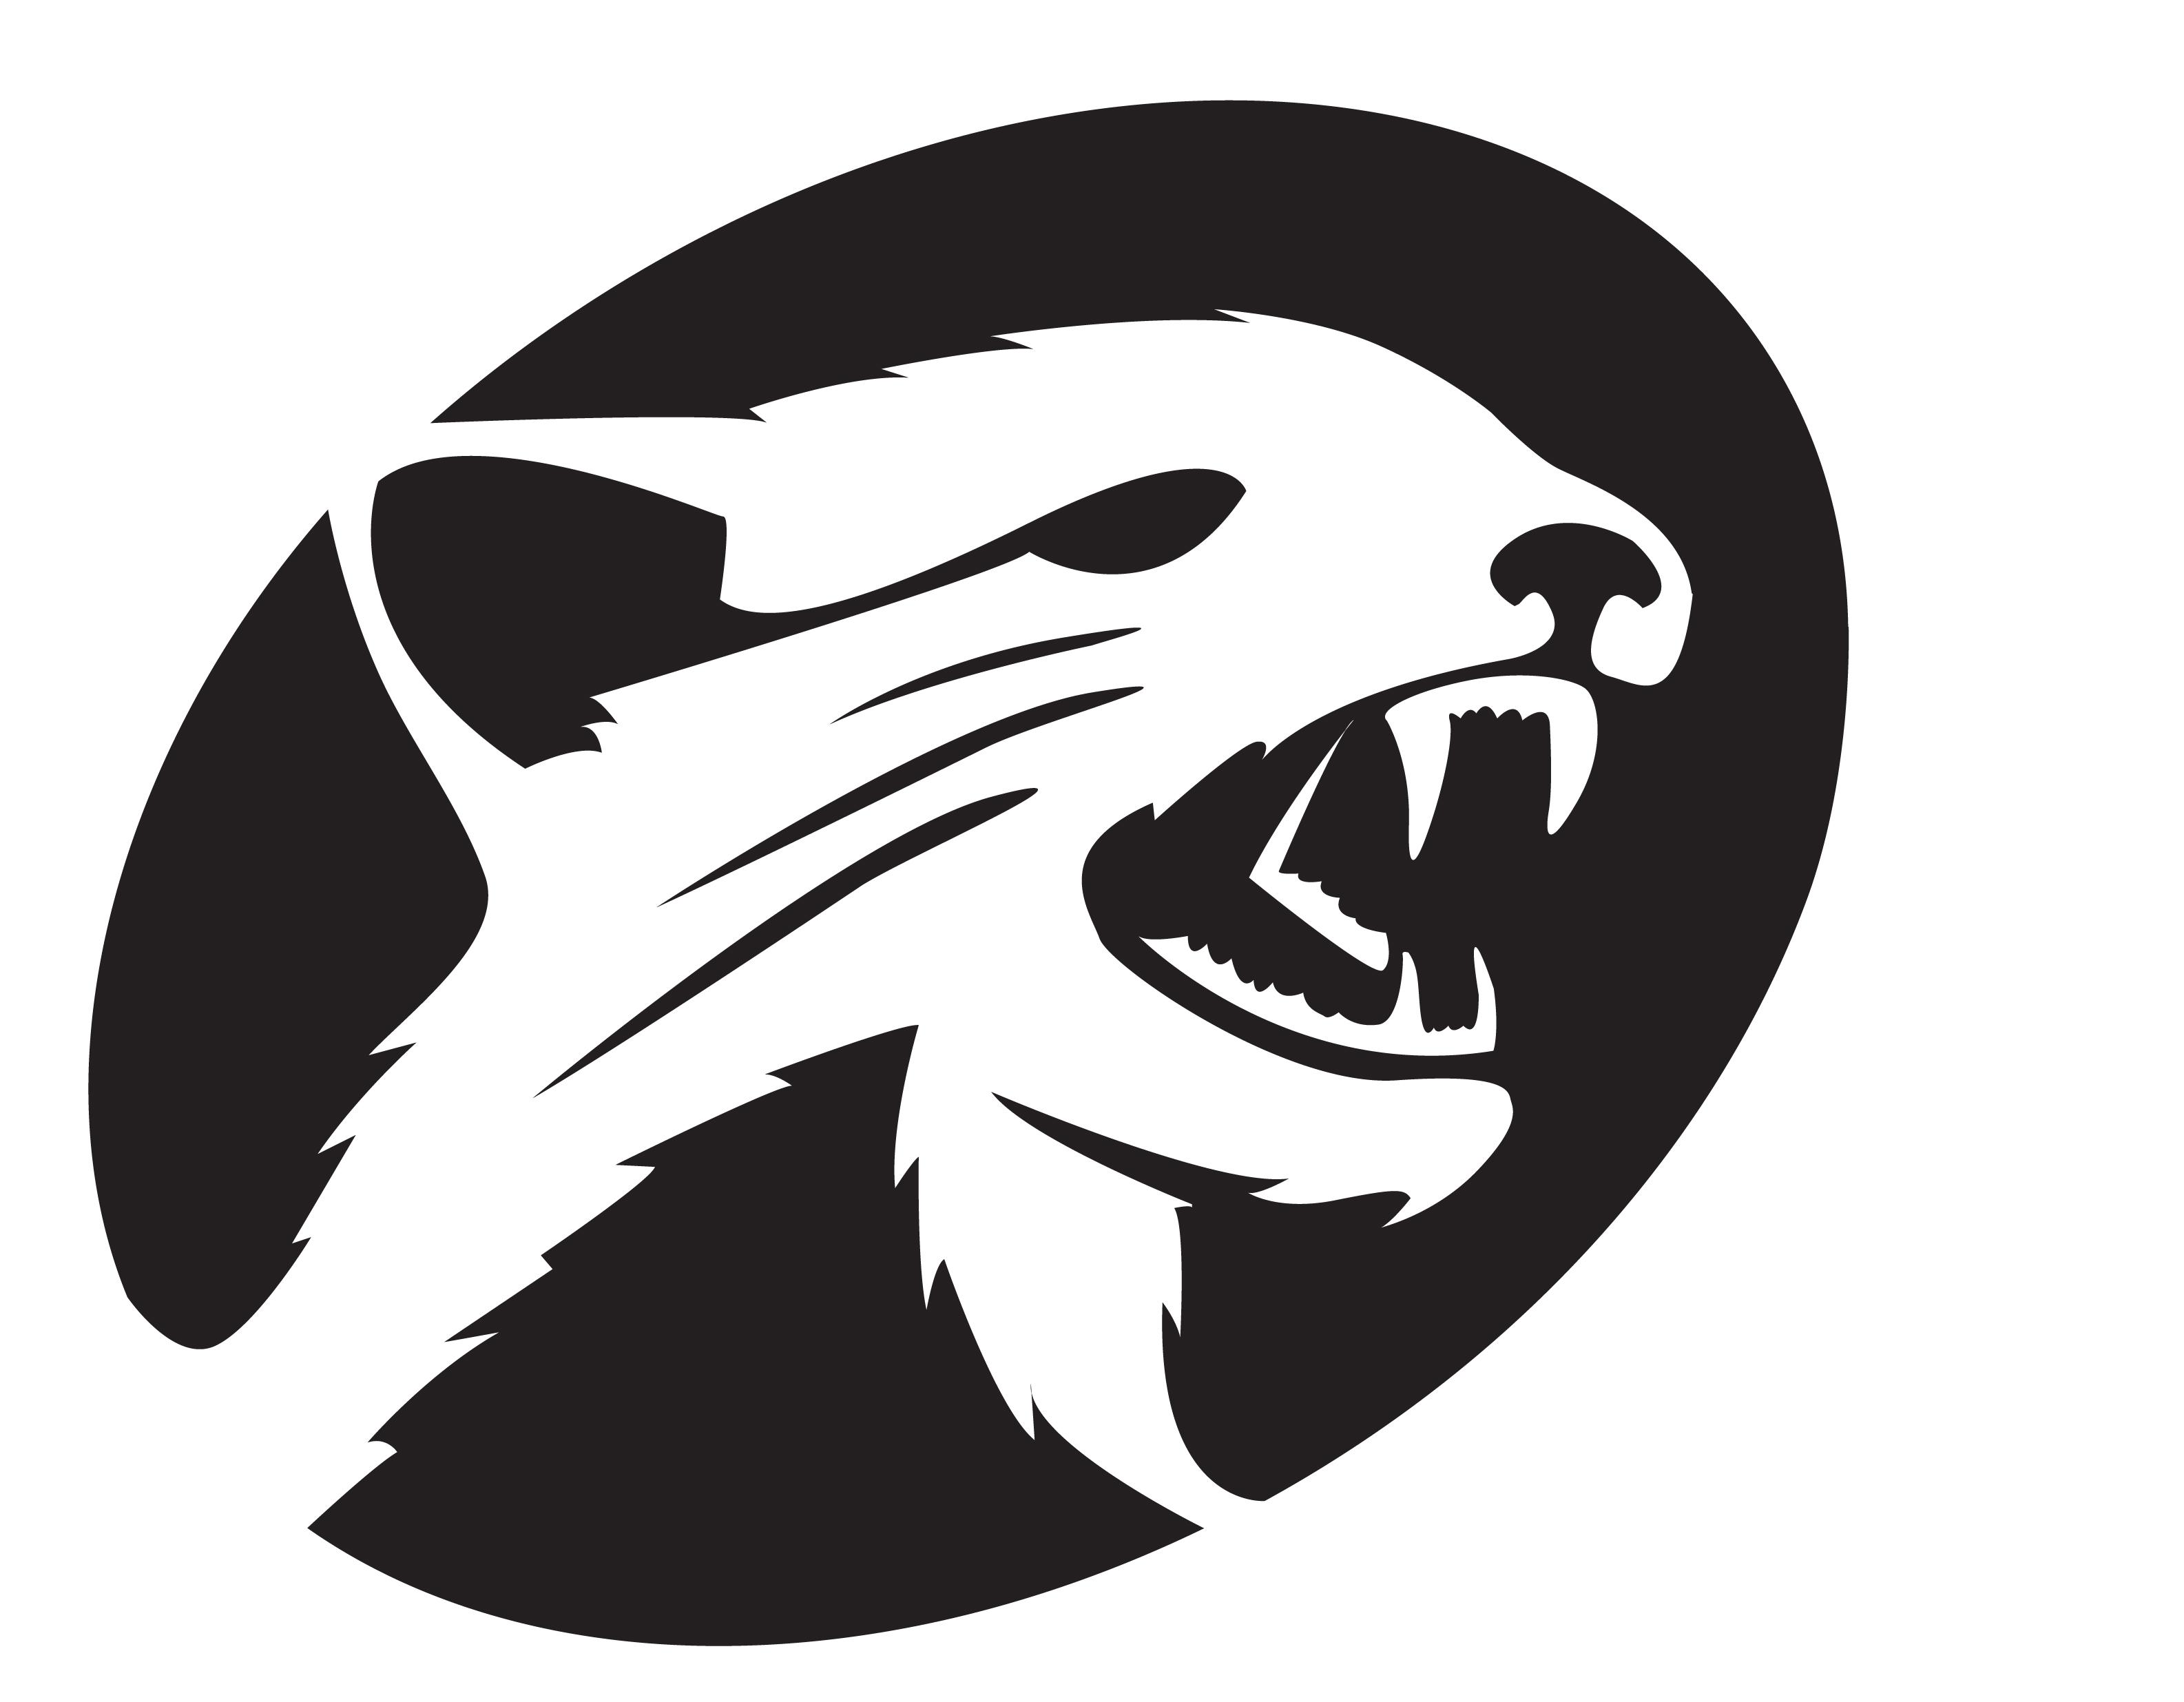 Web Weasel Logo photo - 1